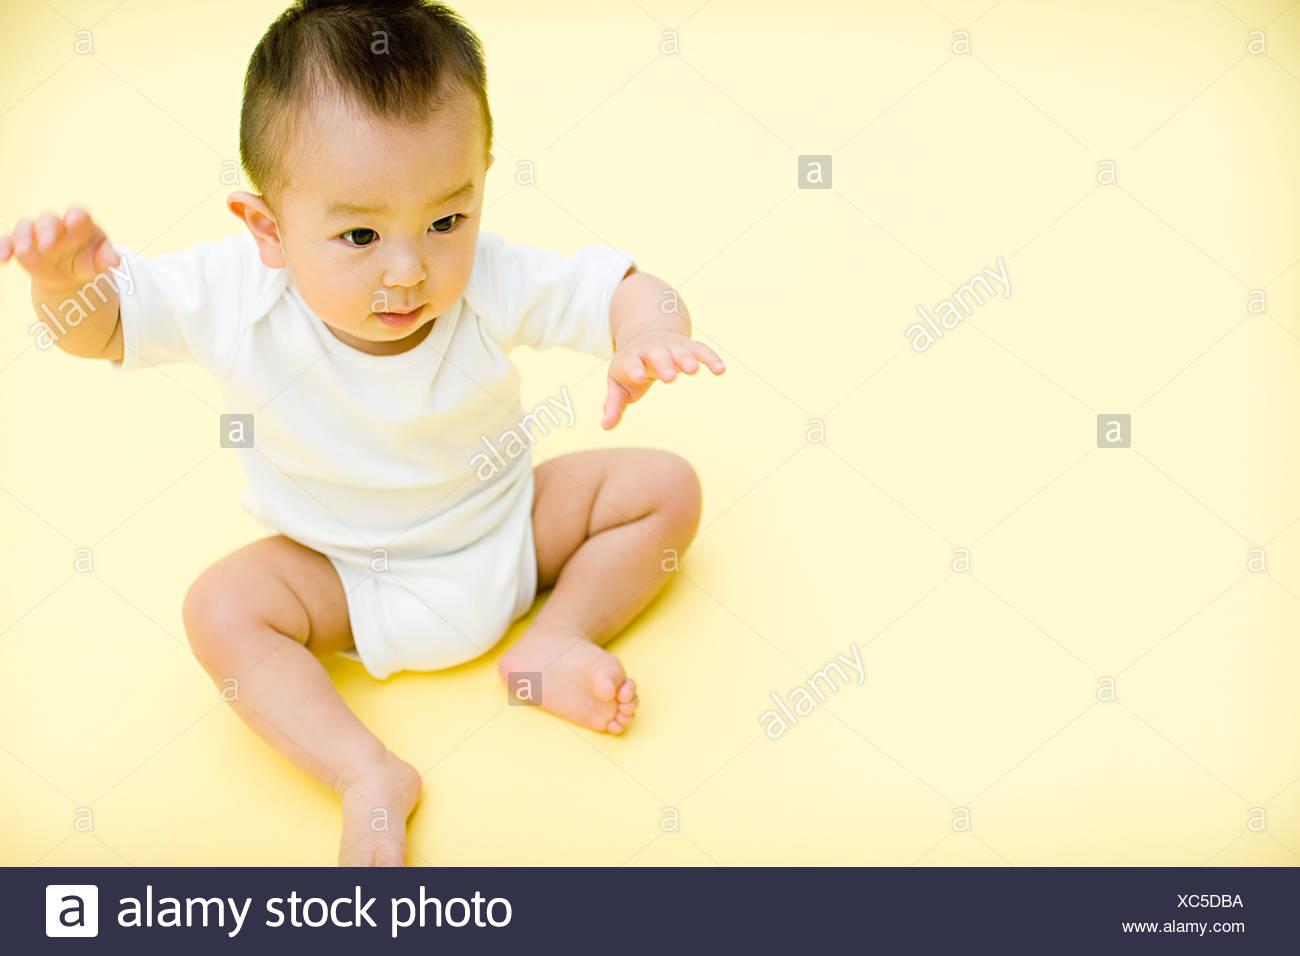 Cute baby - Stock Image